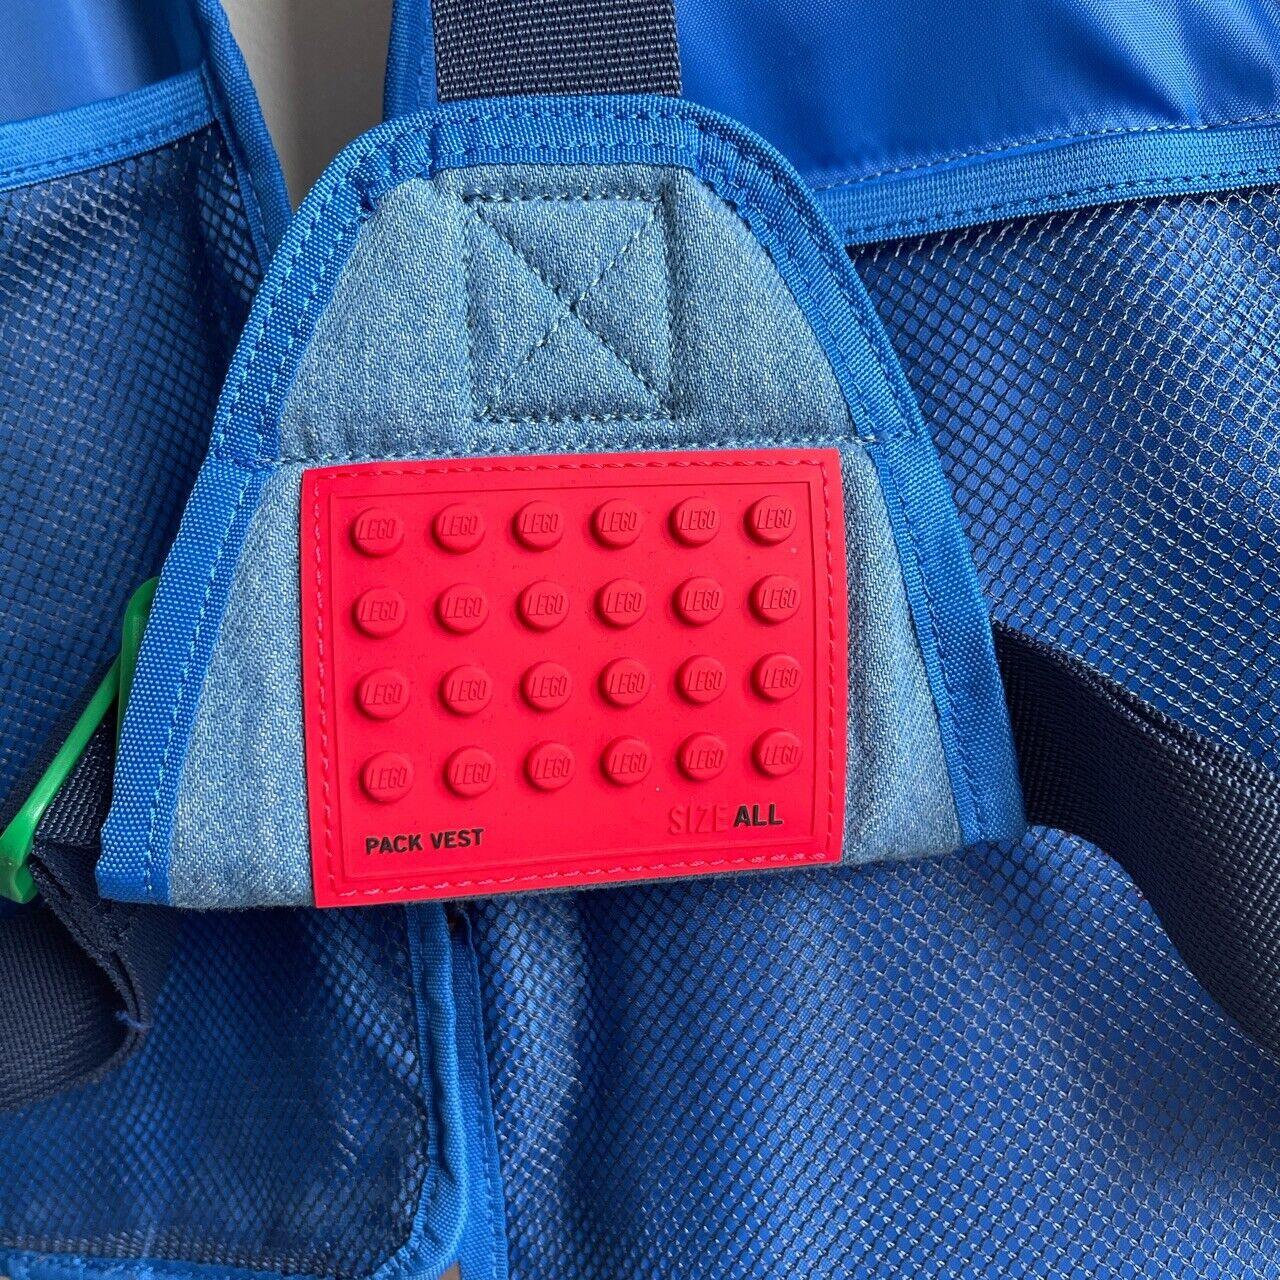 Levi's Legos Denim Tactical Vest  - image 4